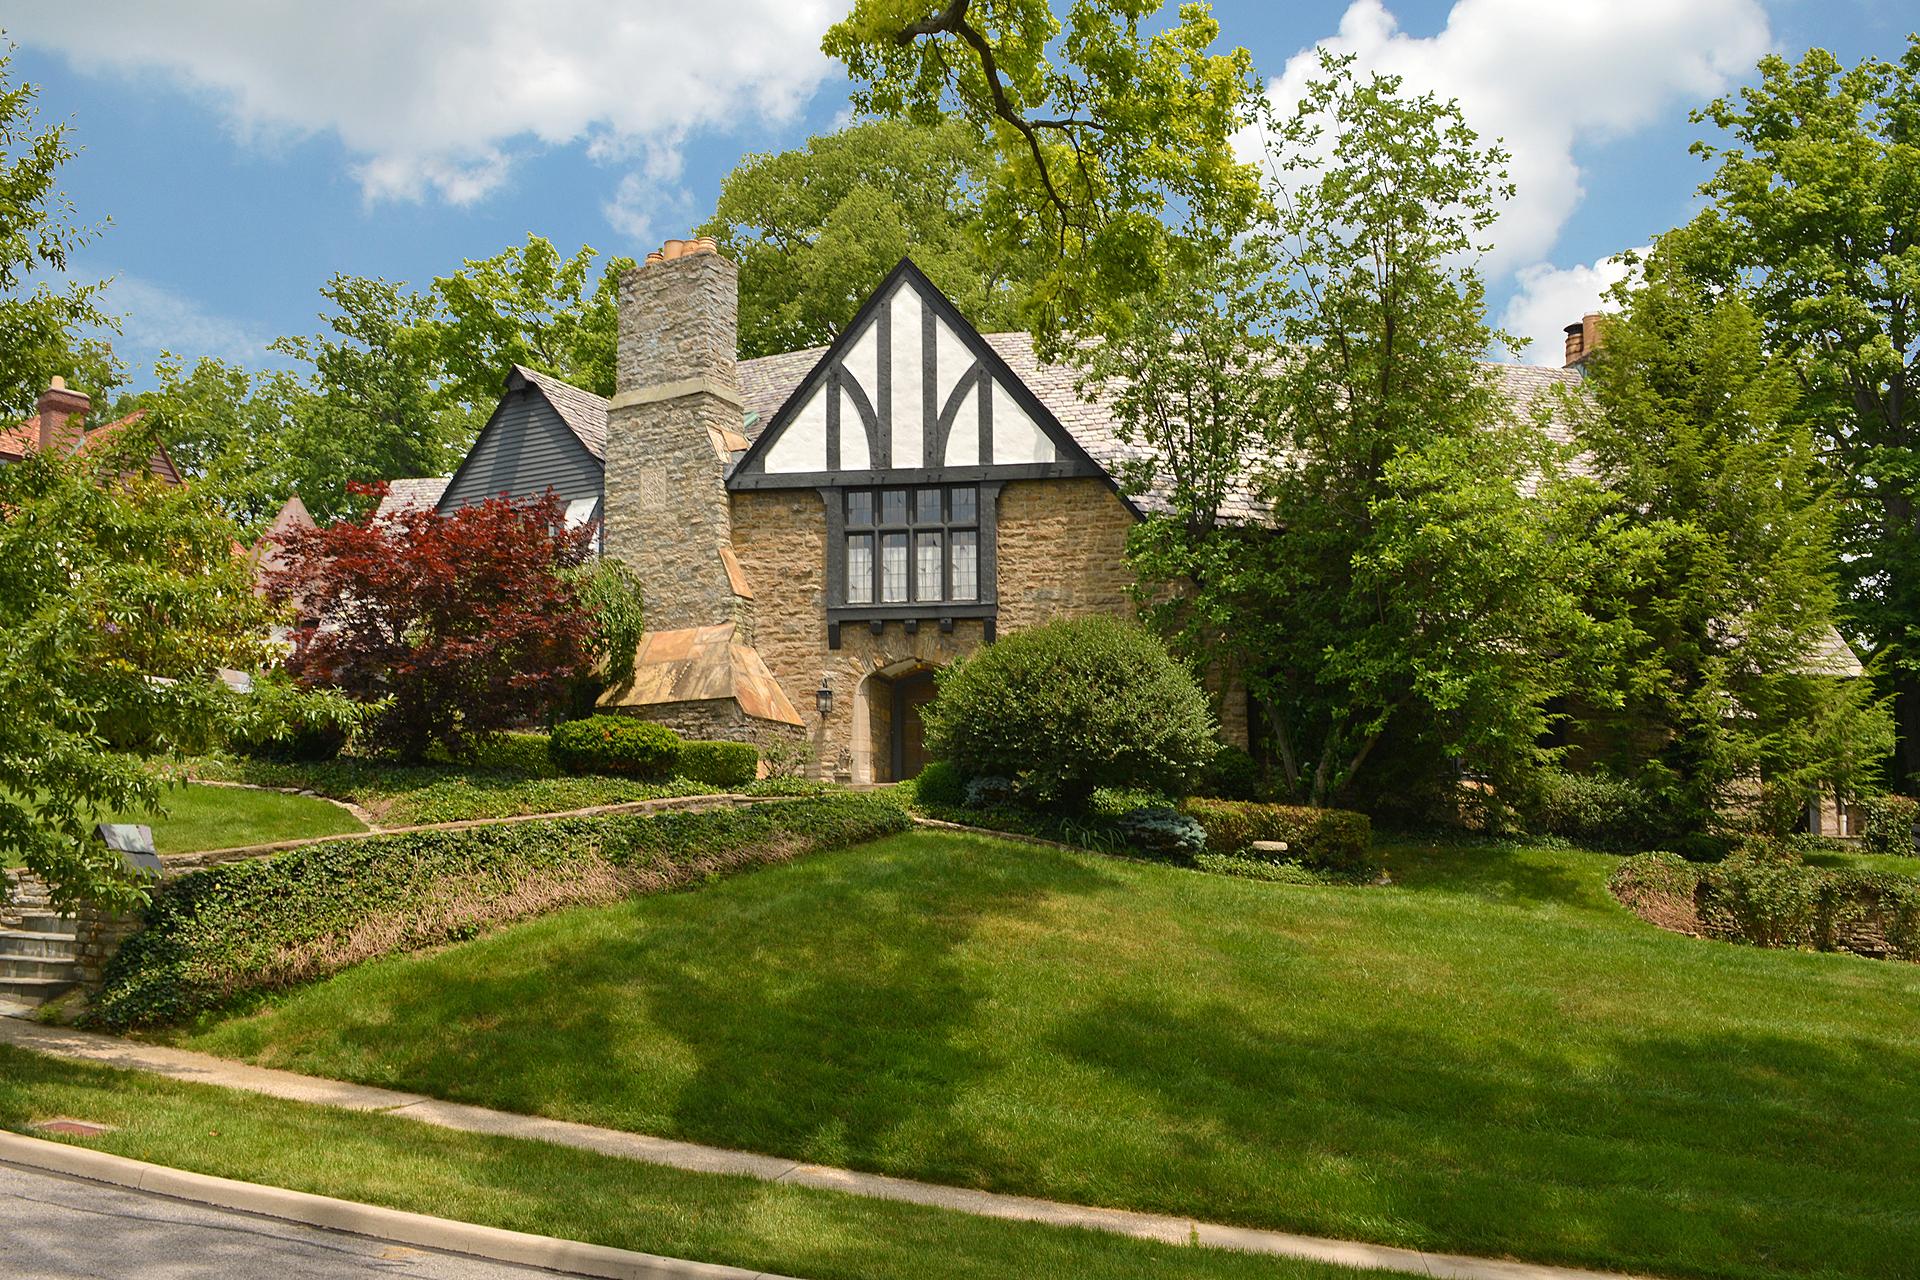 Property For Sale at 2546 Rookwood Drive, Cincinnati